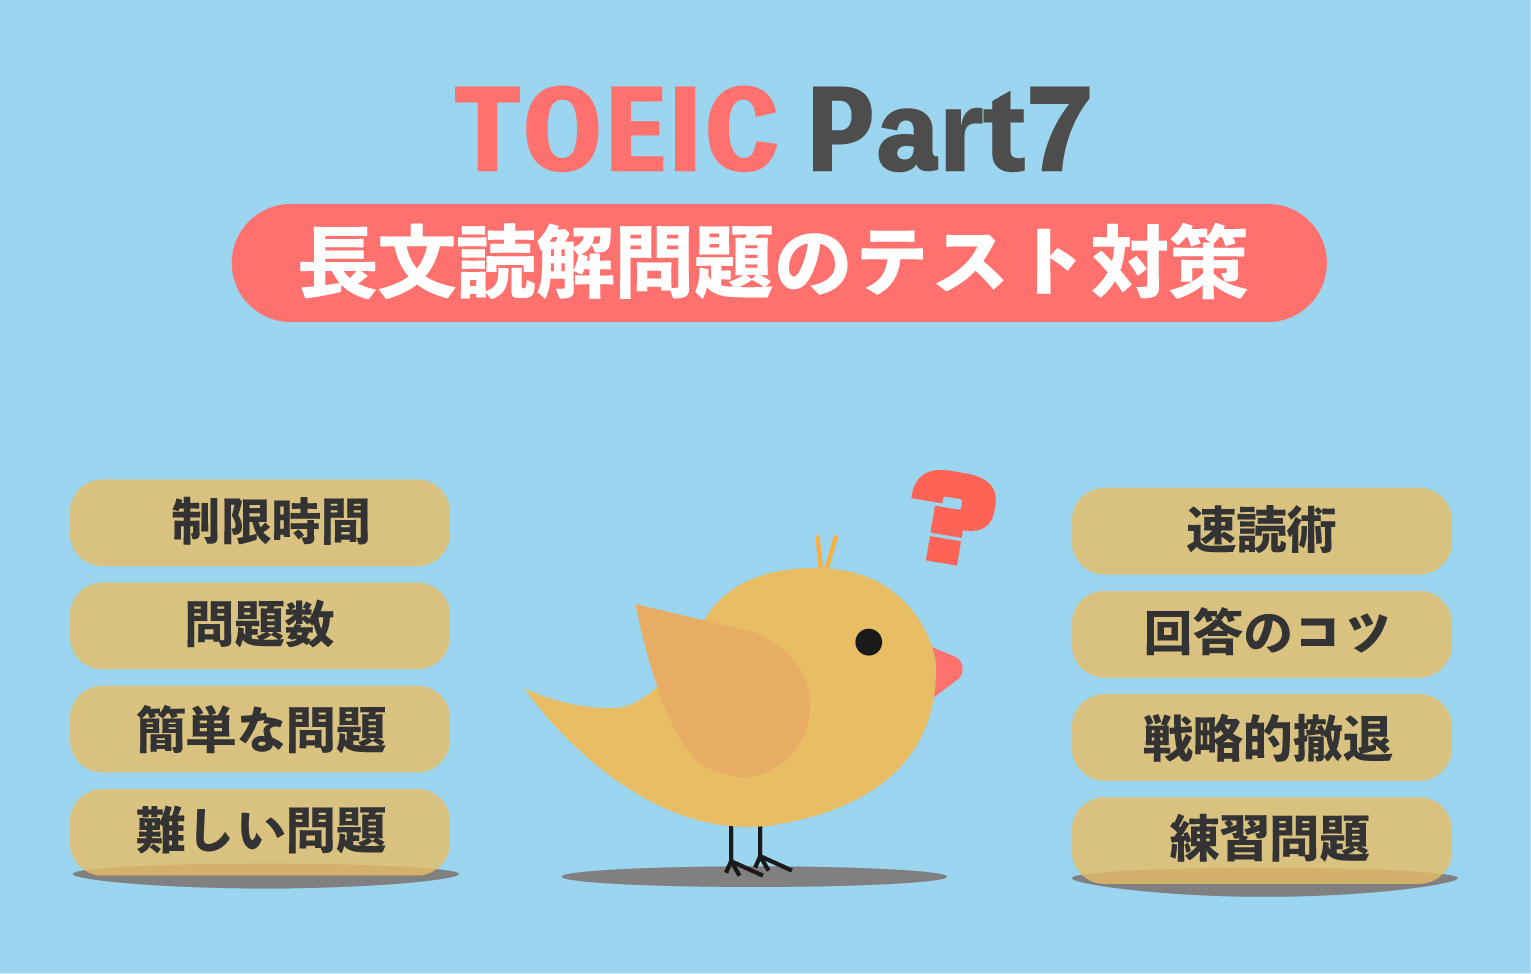 TOEIC Part7 長文問題の対策と勉強法【時間内に回答するコツが分かります】